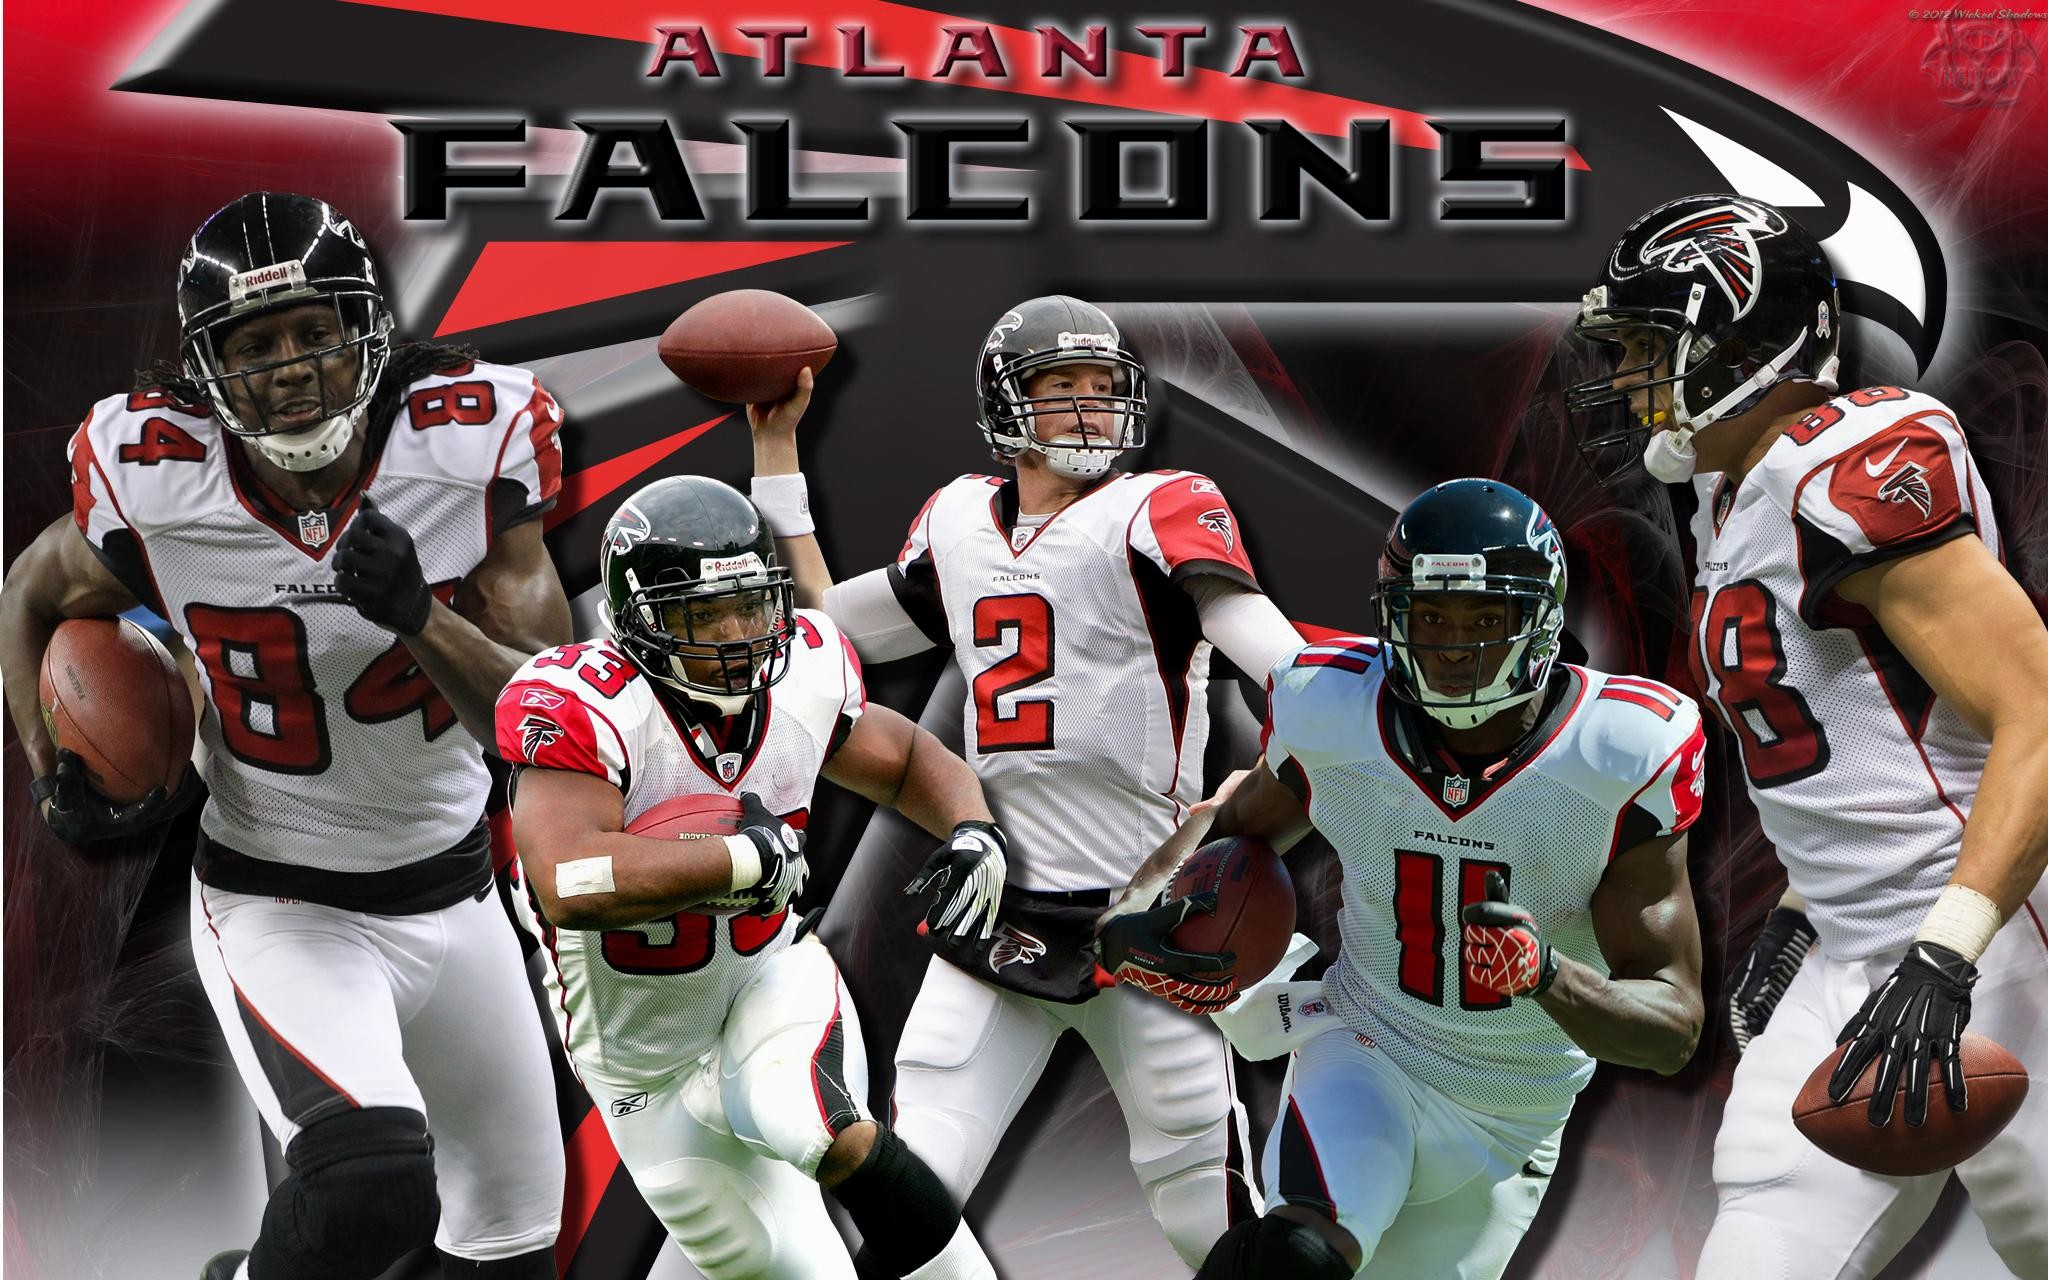 Atlanta-Falcons-vs-Carolina-Panthers-Chirstmas-Eve-NFL-